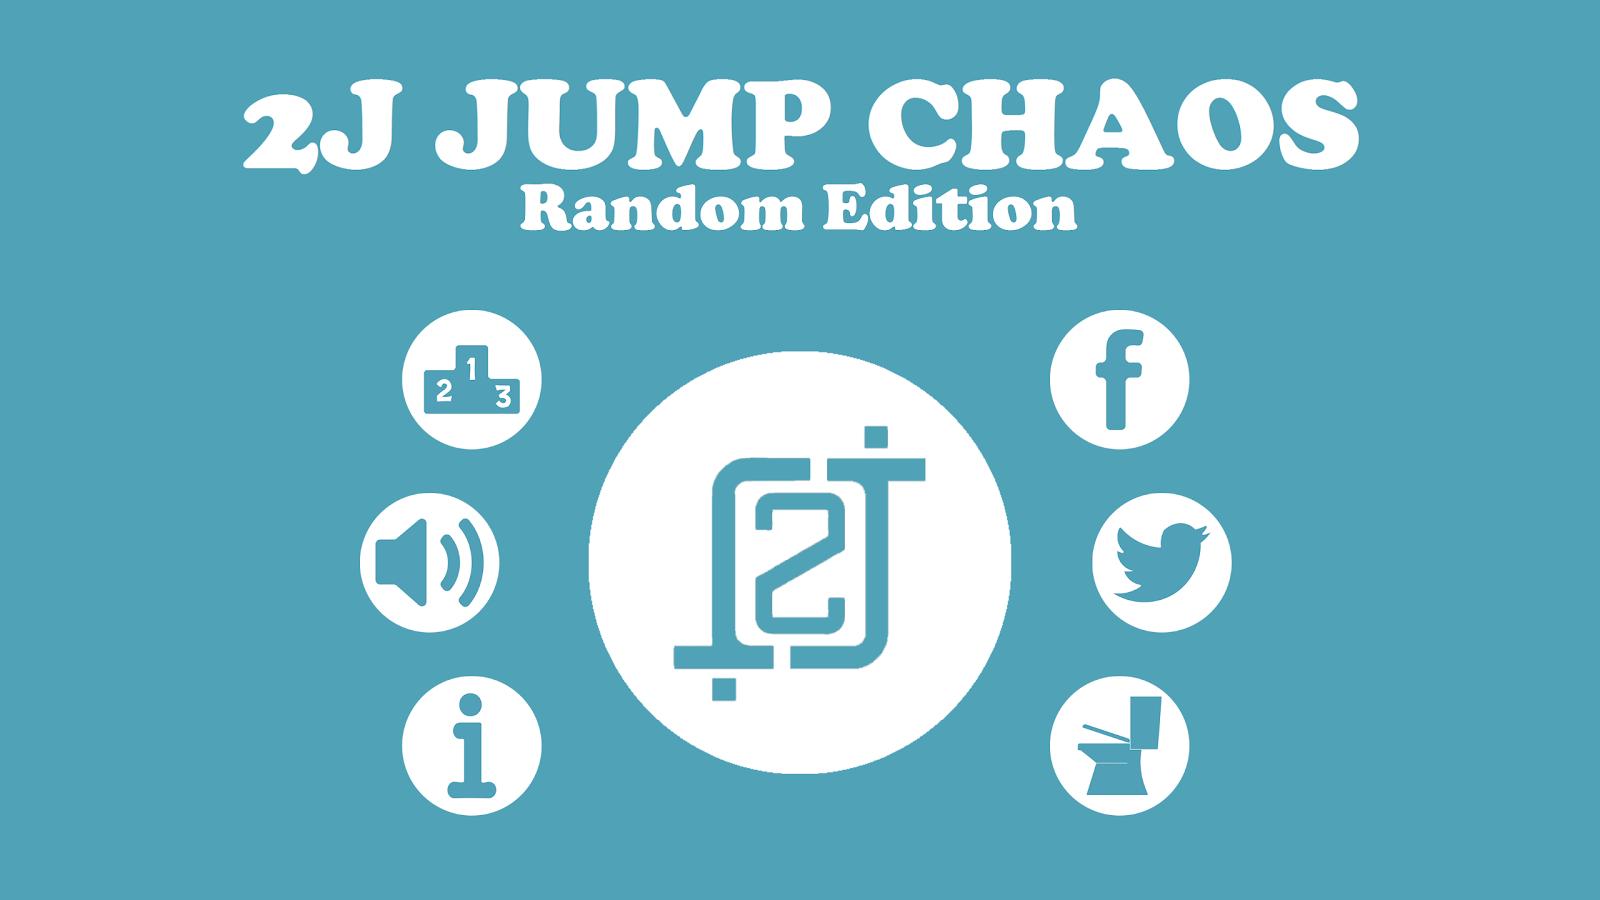 2J Jump Chaos (Random Edition) - screenshot